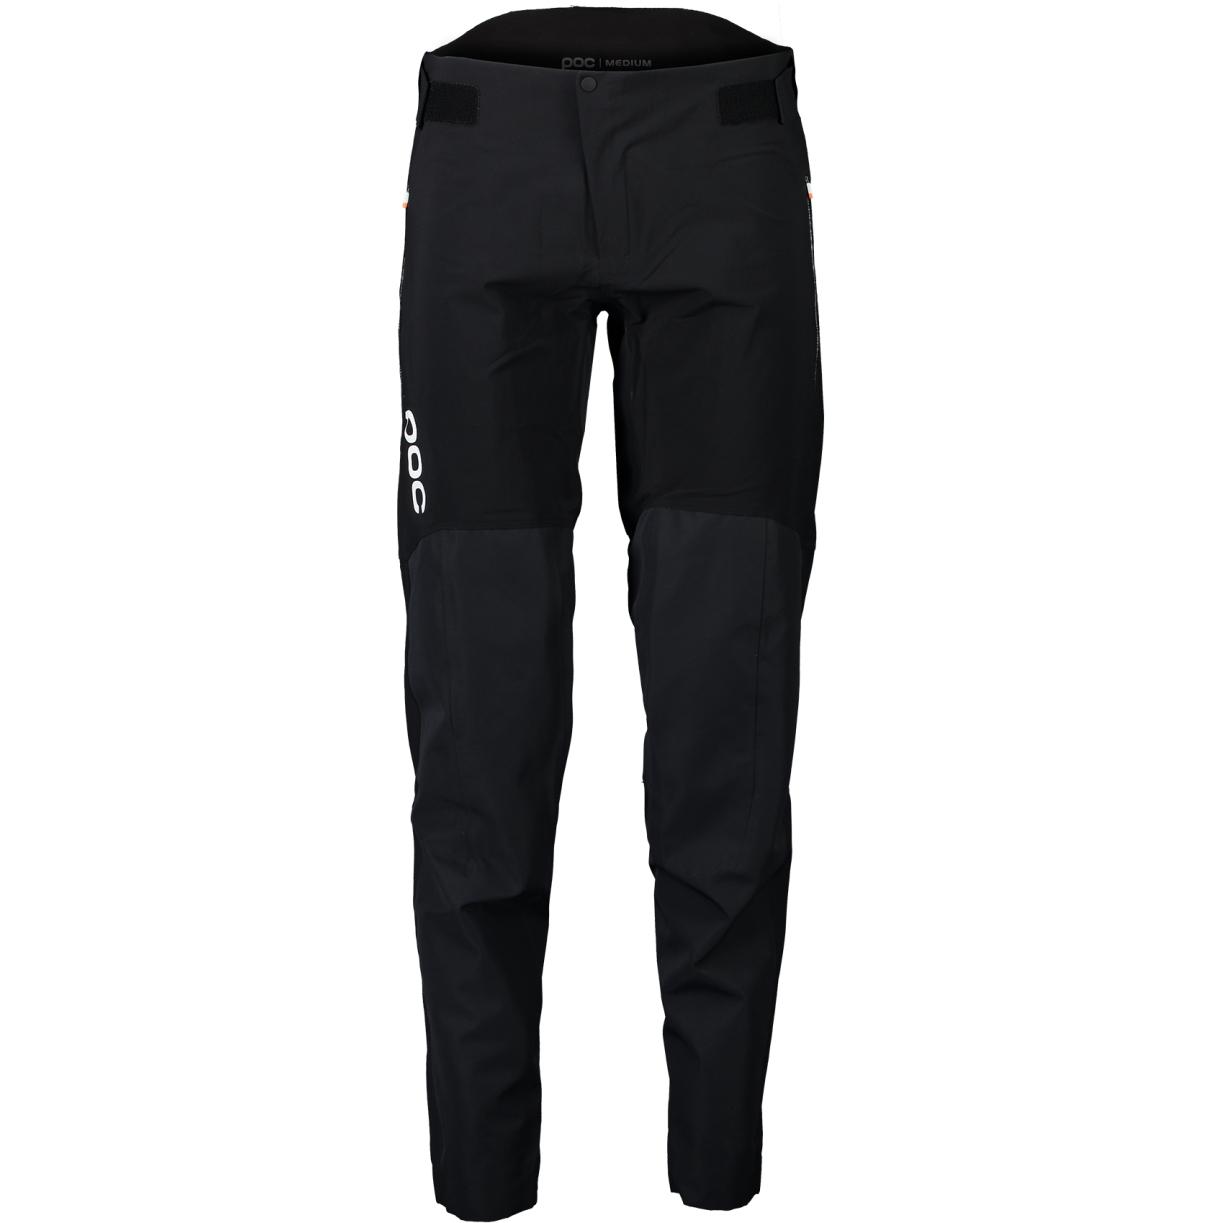 Foto de POC Ardour Pantalones para Todas las Estaciones - 1002 Uranium Black